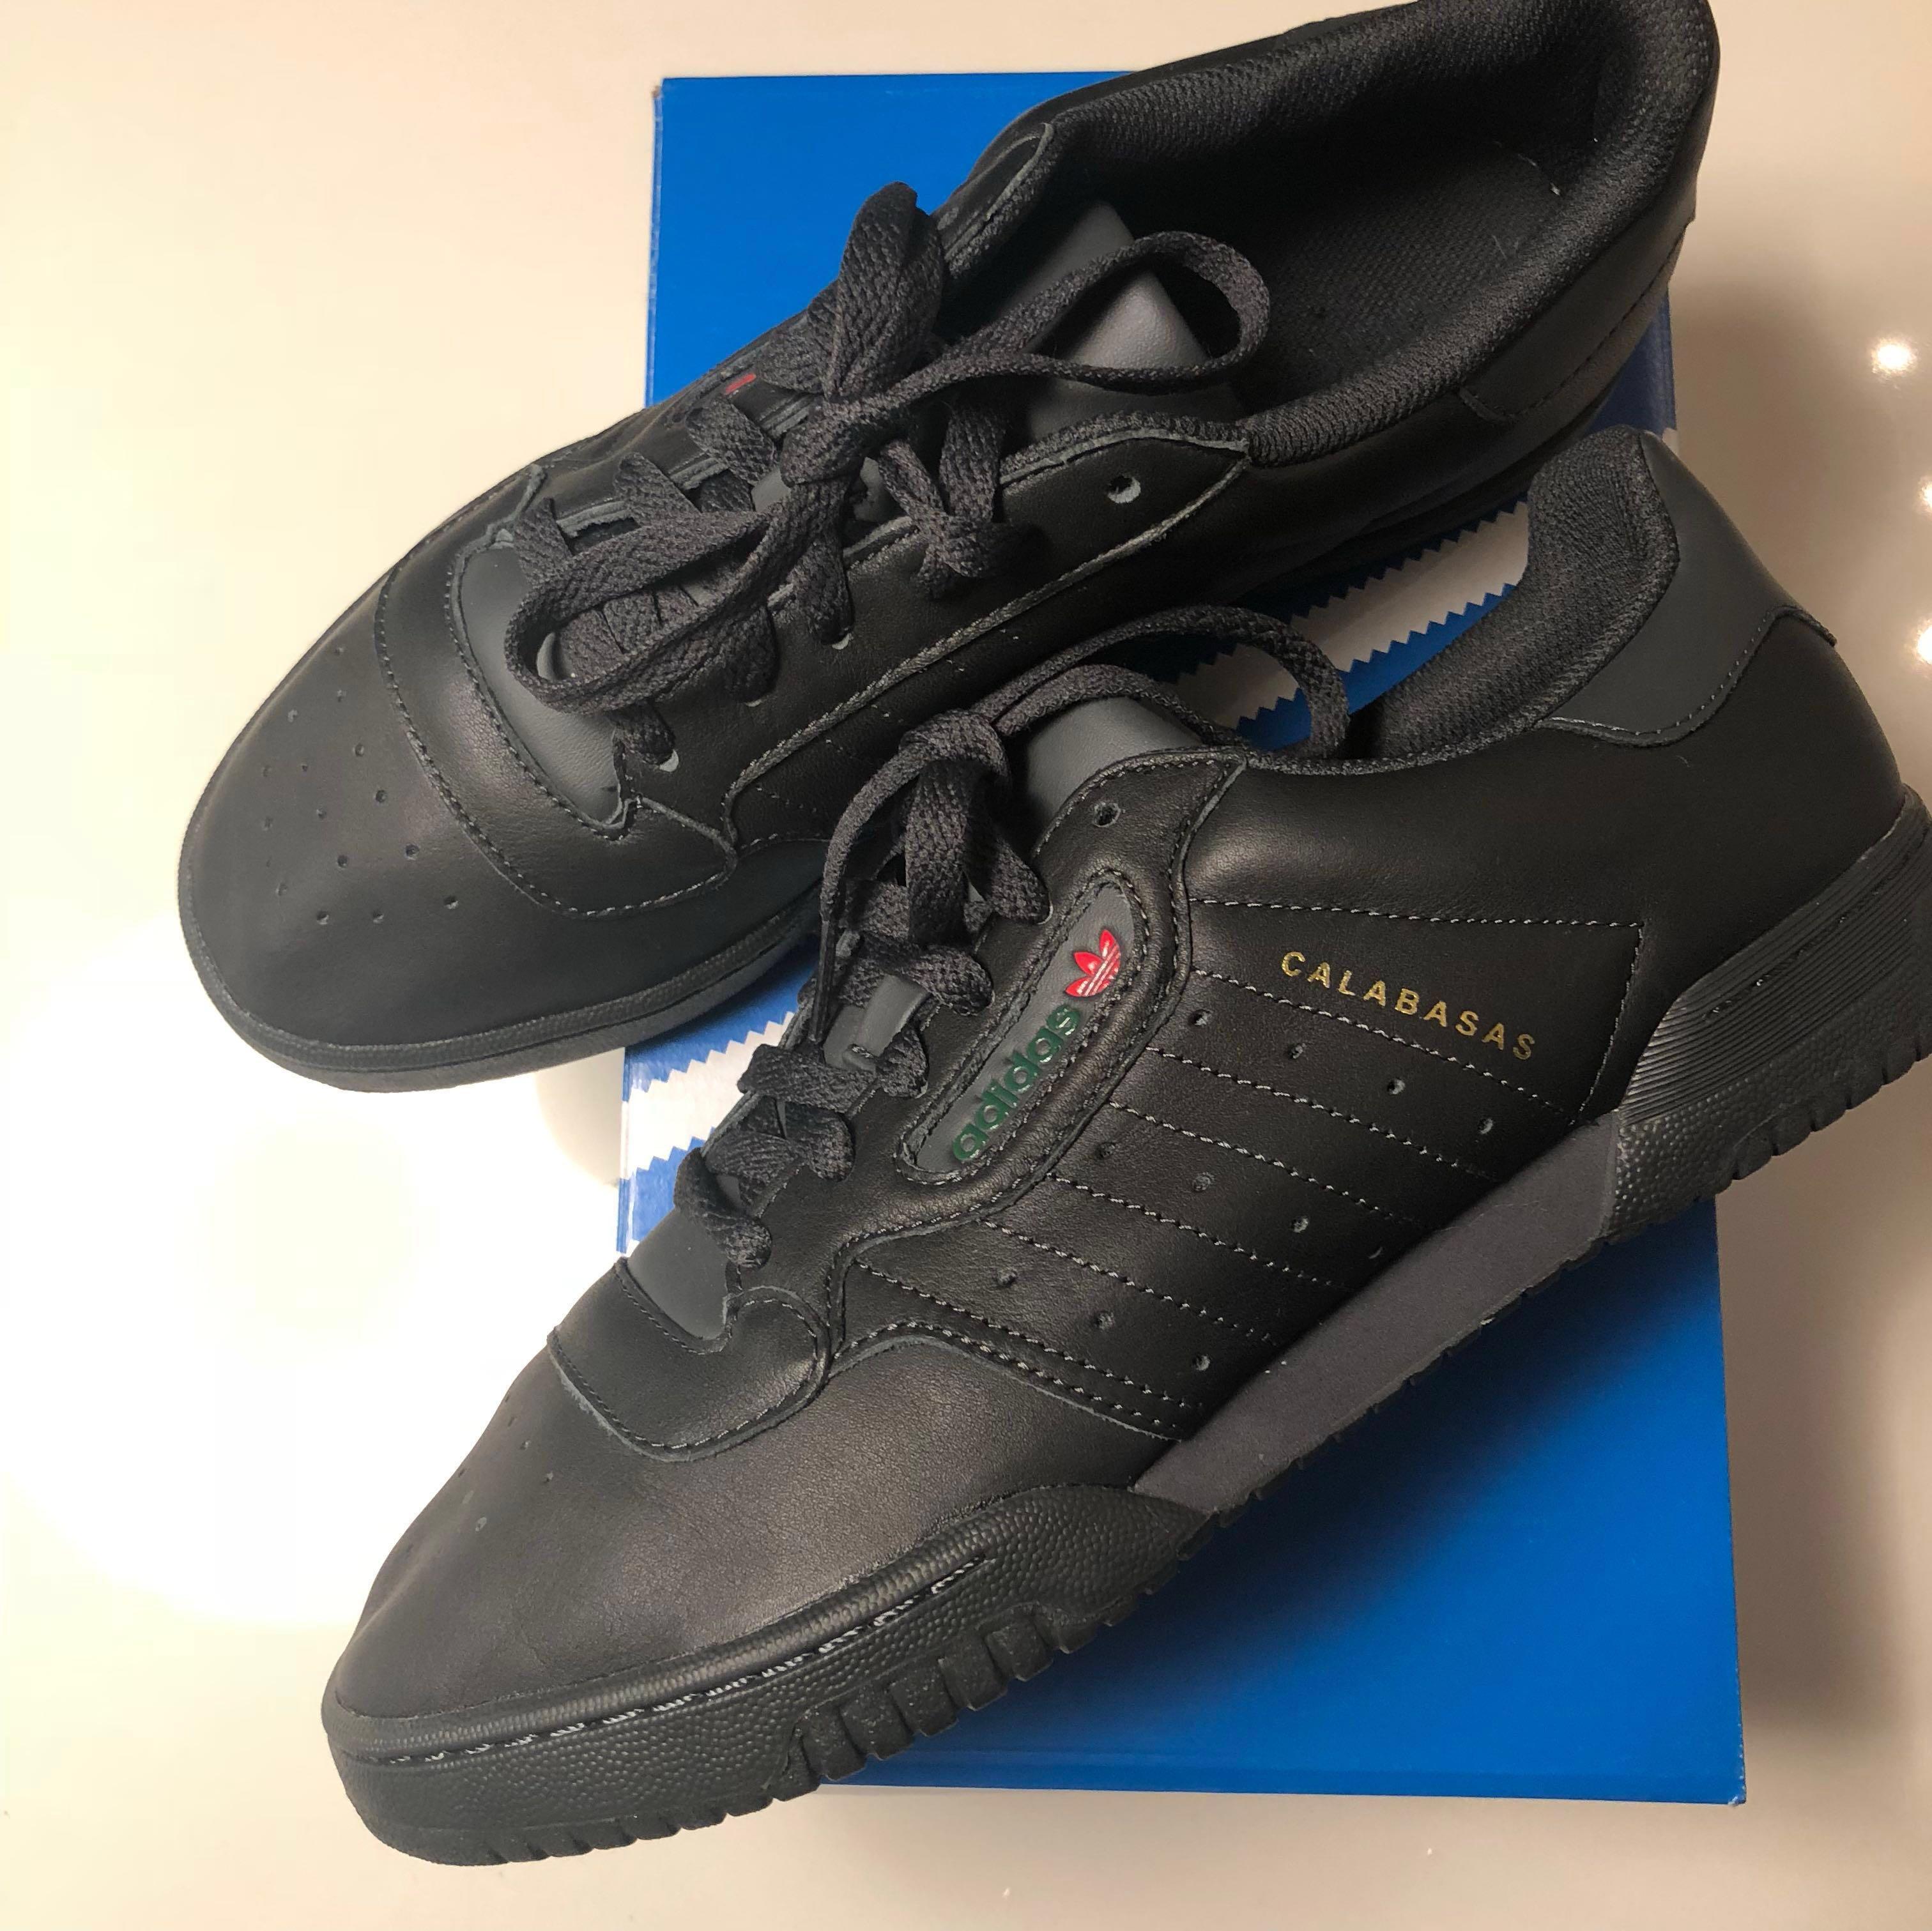 395ded935b336 Adidas Yeezy Powerphase Calabasas Black